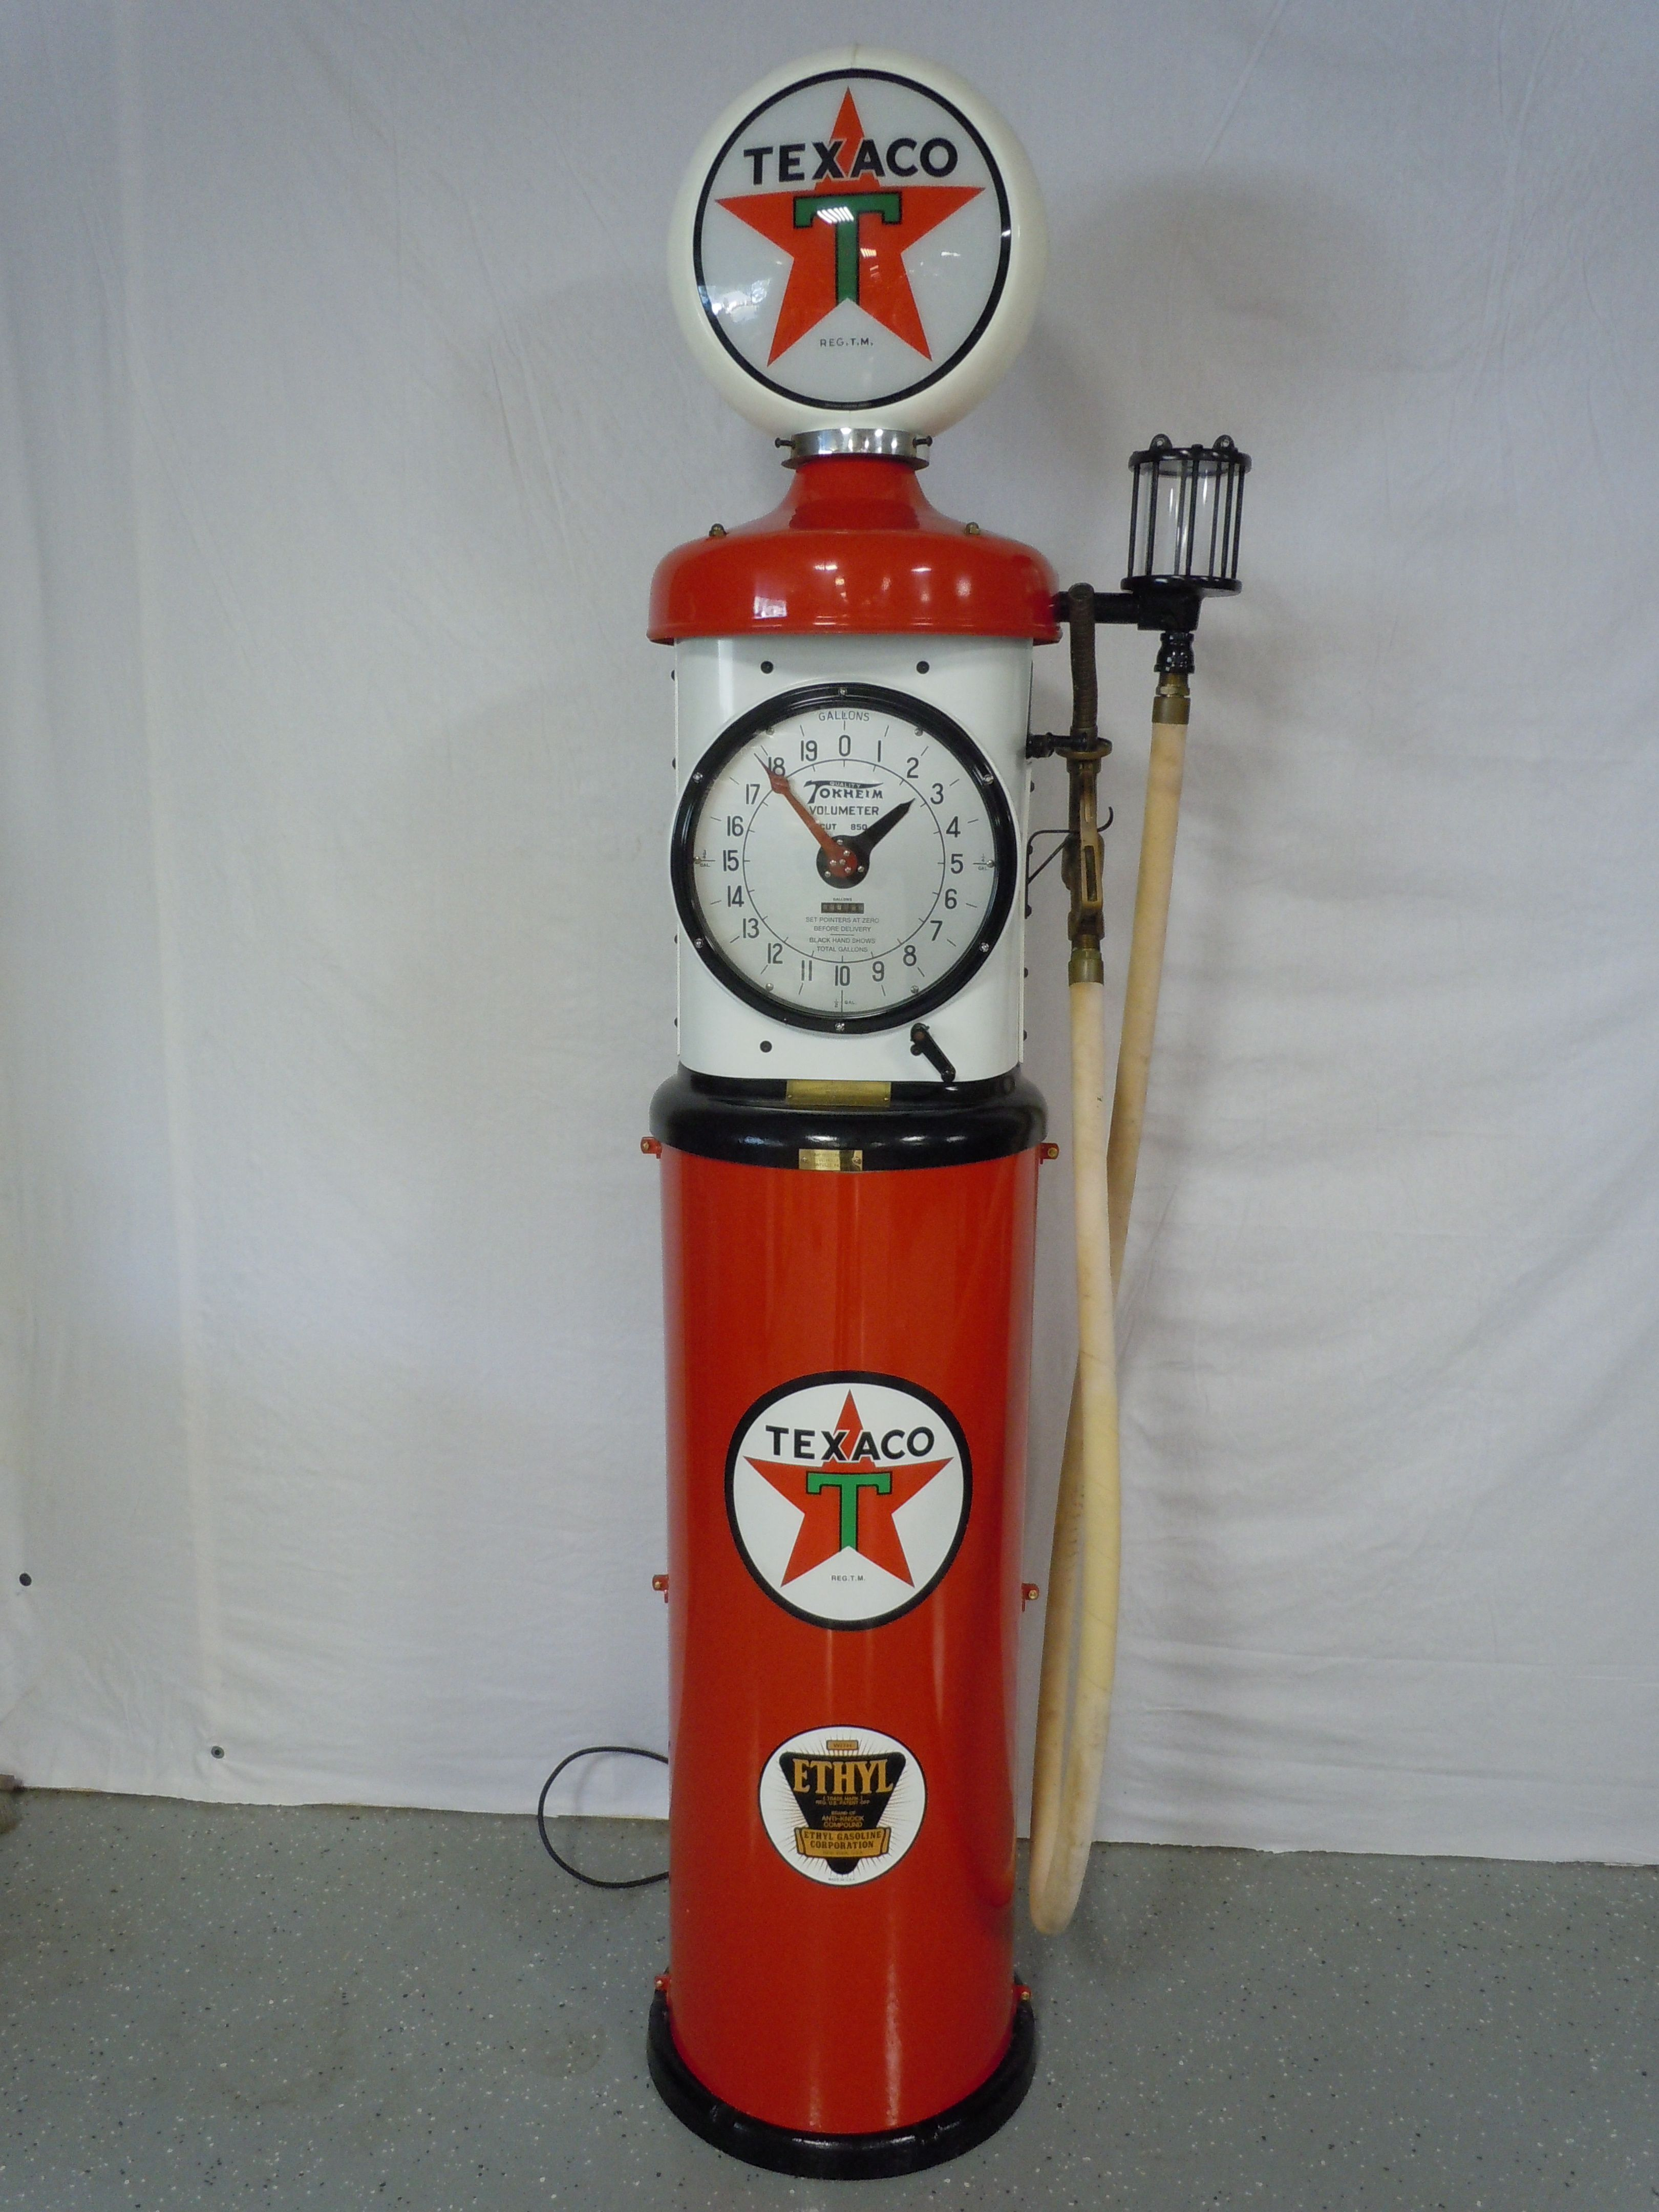 Very nice restored original Tokheim 850 gas pump done in